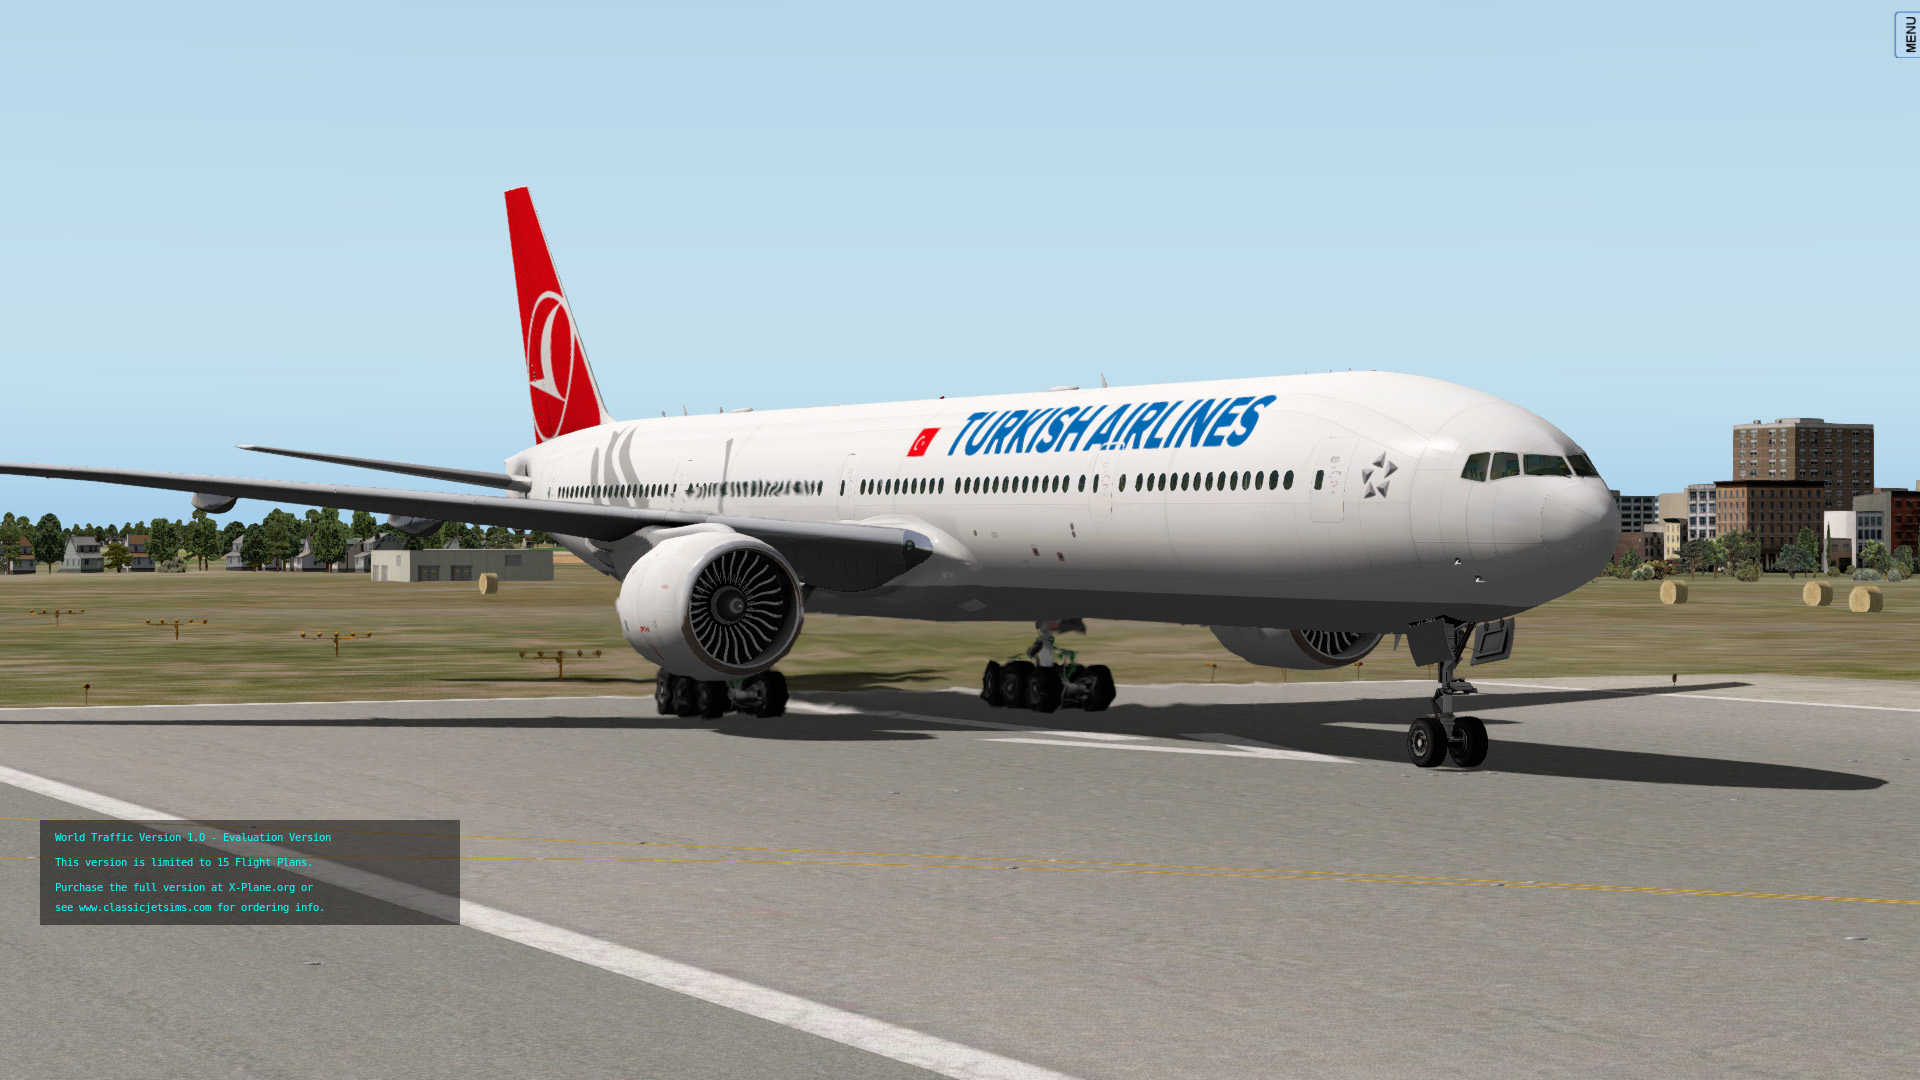 Turkish Airlines - Boeing 777-300 ER - Aircraft Skins